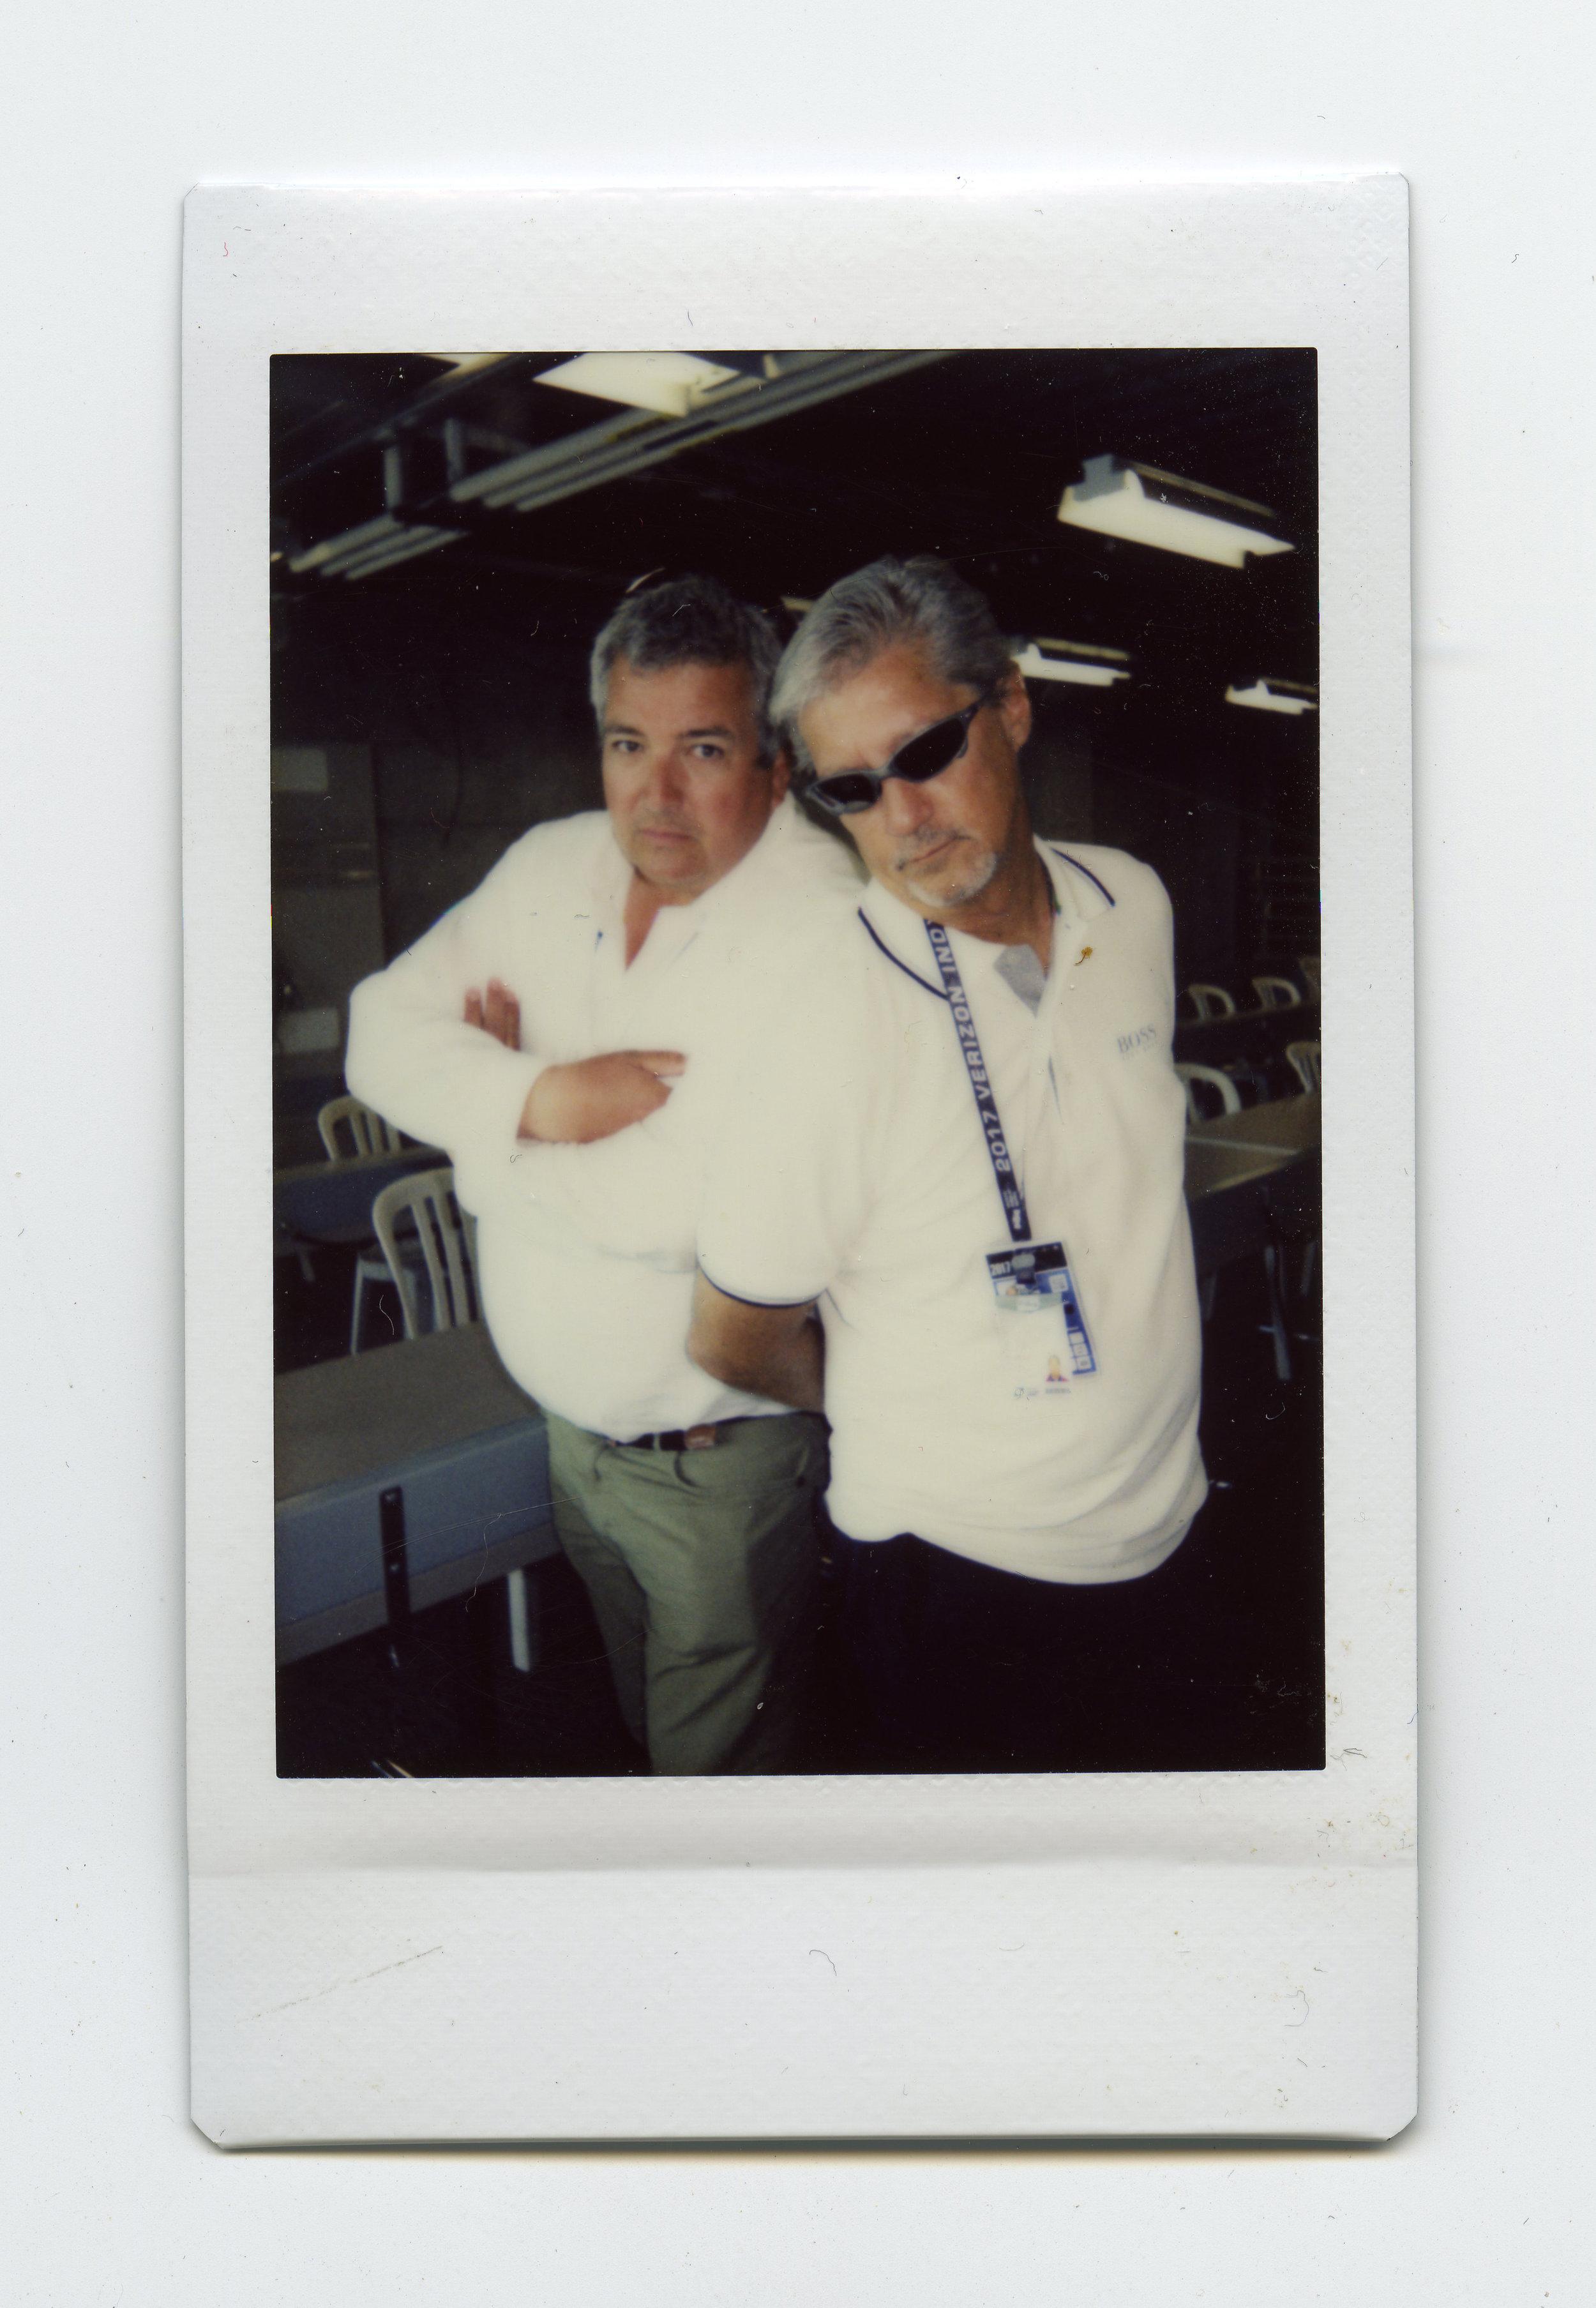 Mike Levitt & Steve Swope - Shot on Fujifilm Neo90 Camera with Fuji Instant Film - Indianapolis Motor Speedway